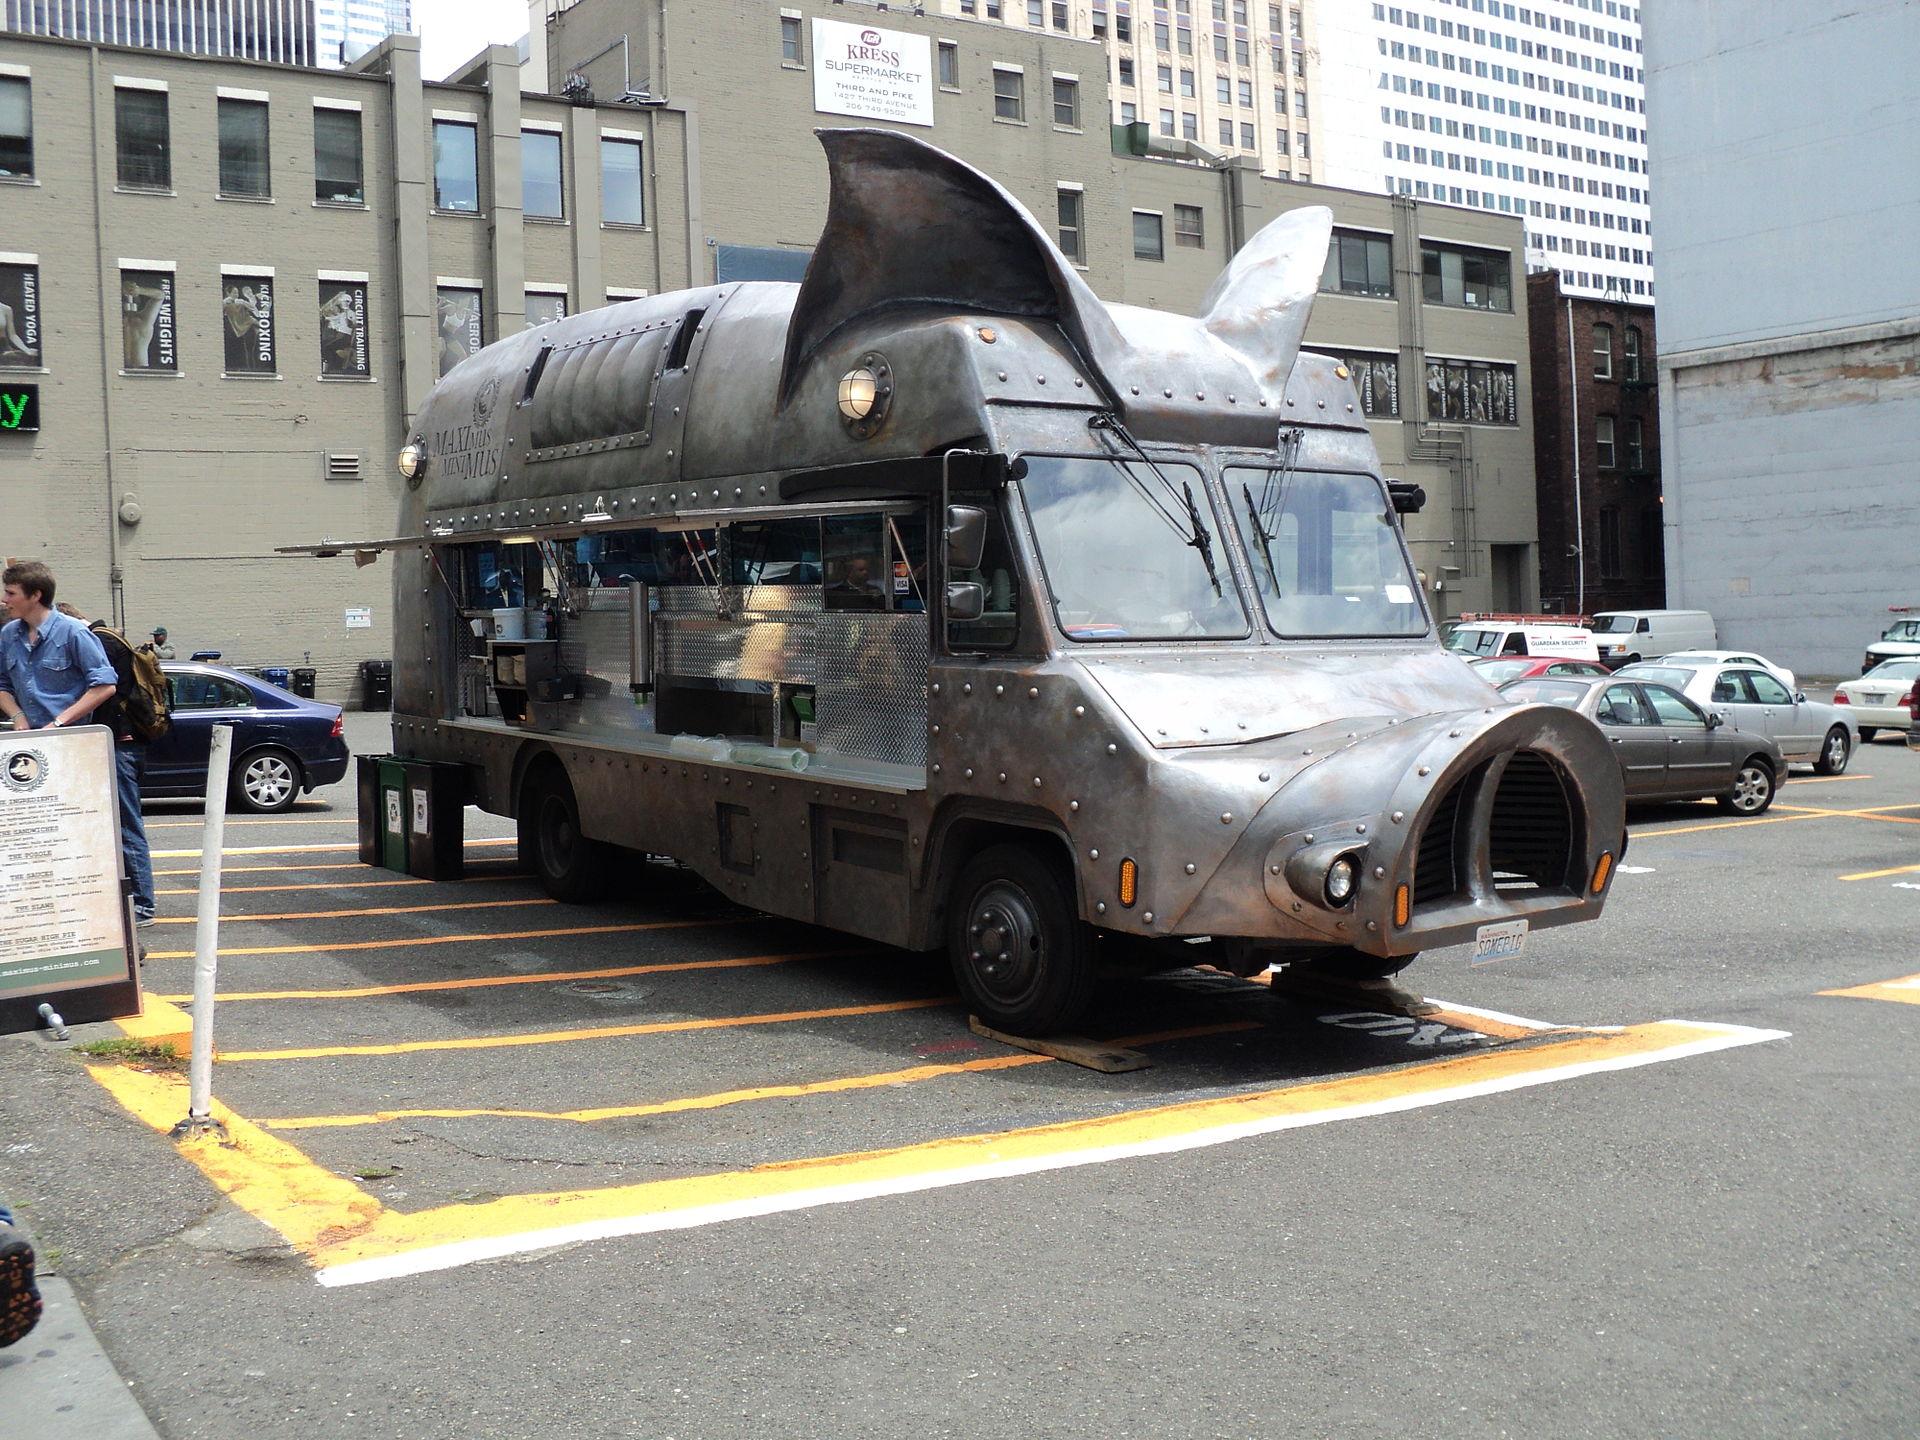 The Maximus/Minimus food truck  - Seattle, Washington, 2010